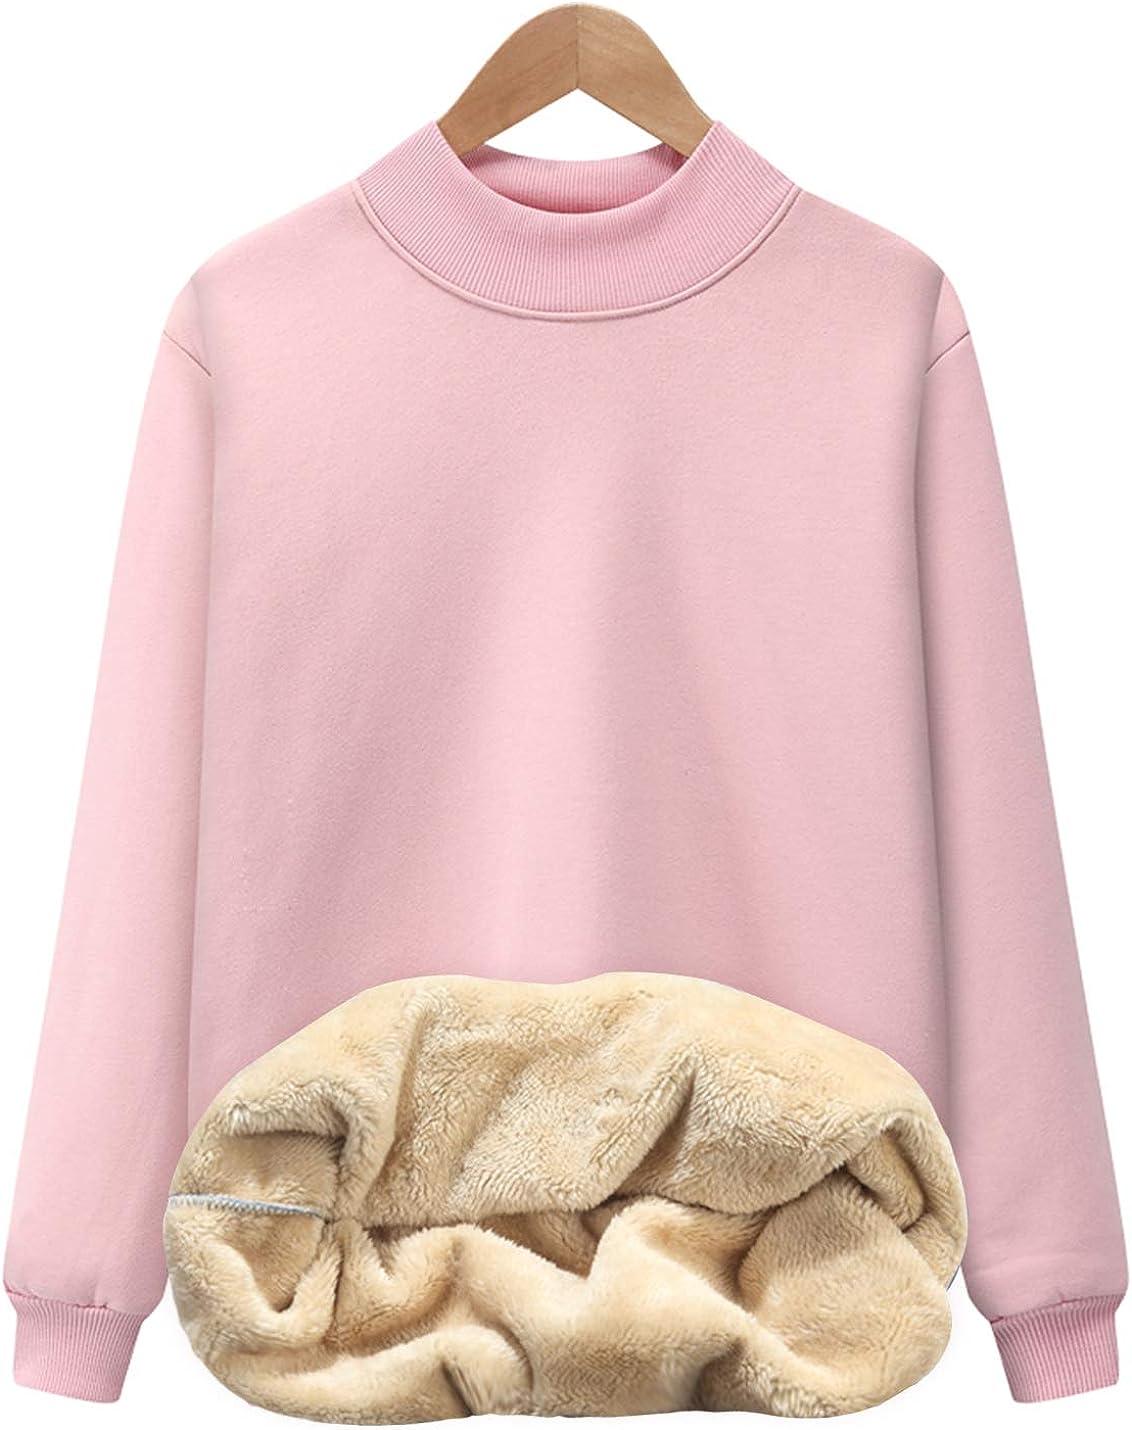 Flygo Women's Girls Warm Fleece Sherpa Lined High Neck Pullover Sweatshirt